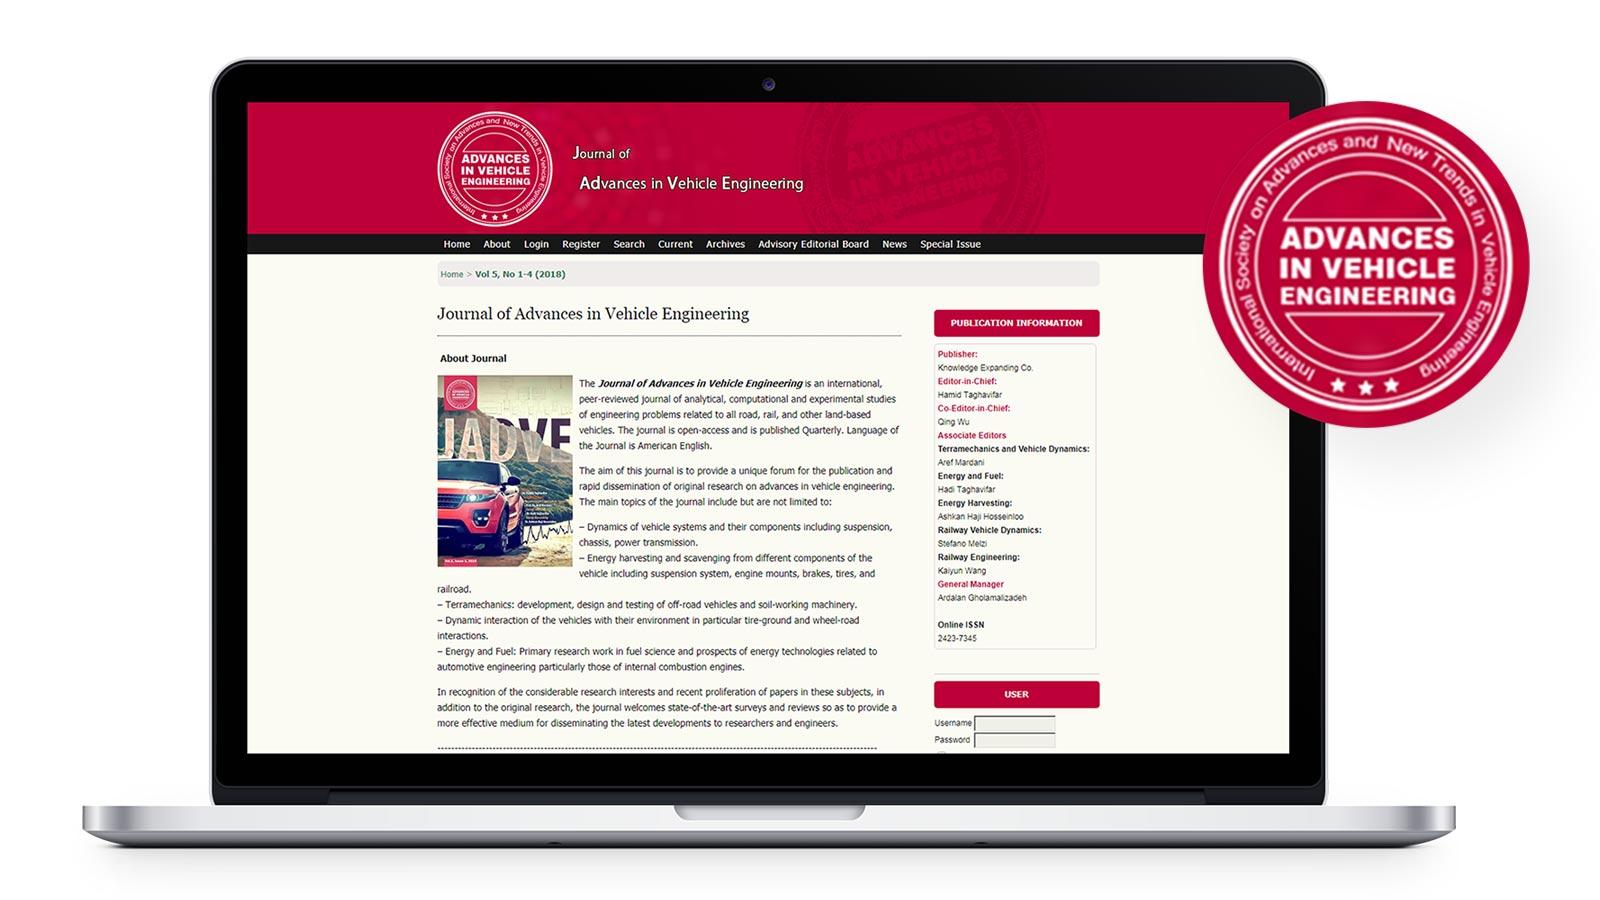 urmia web design